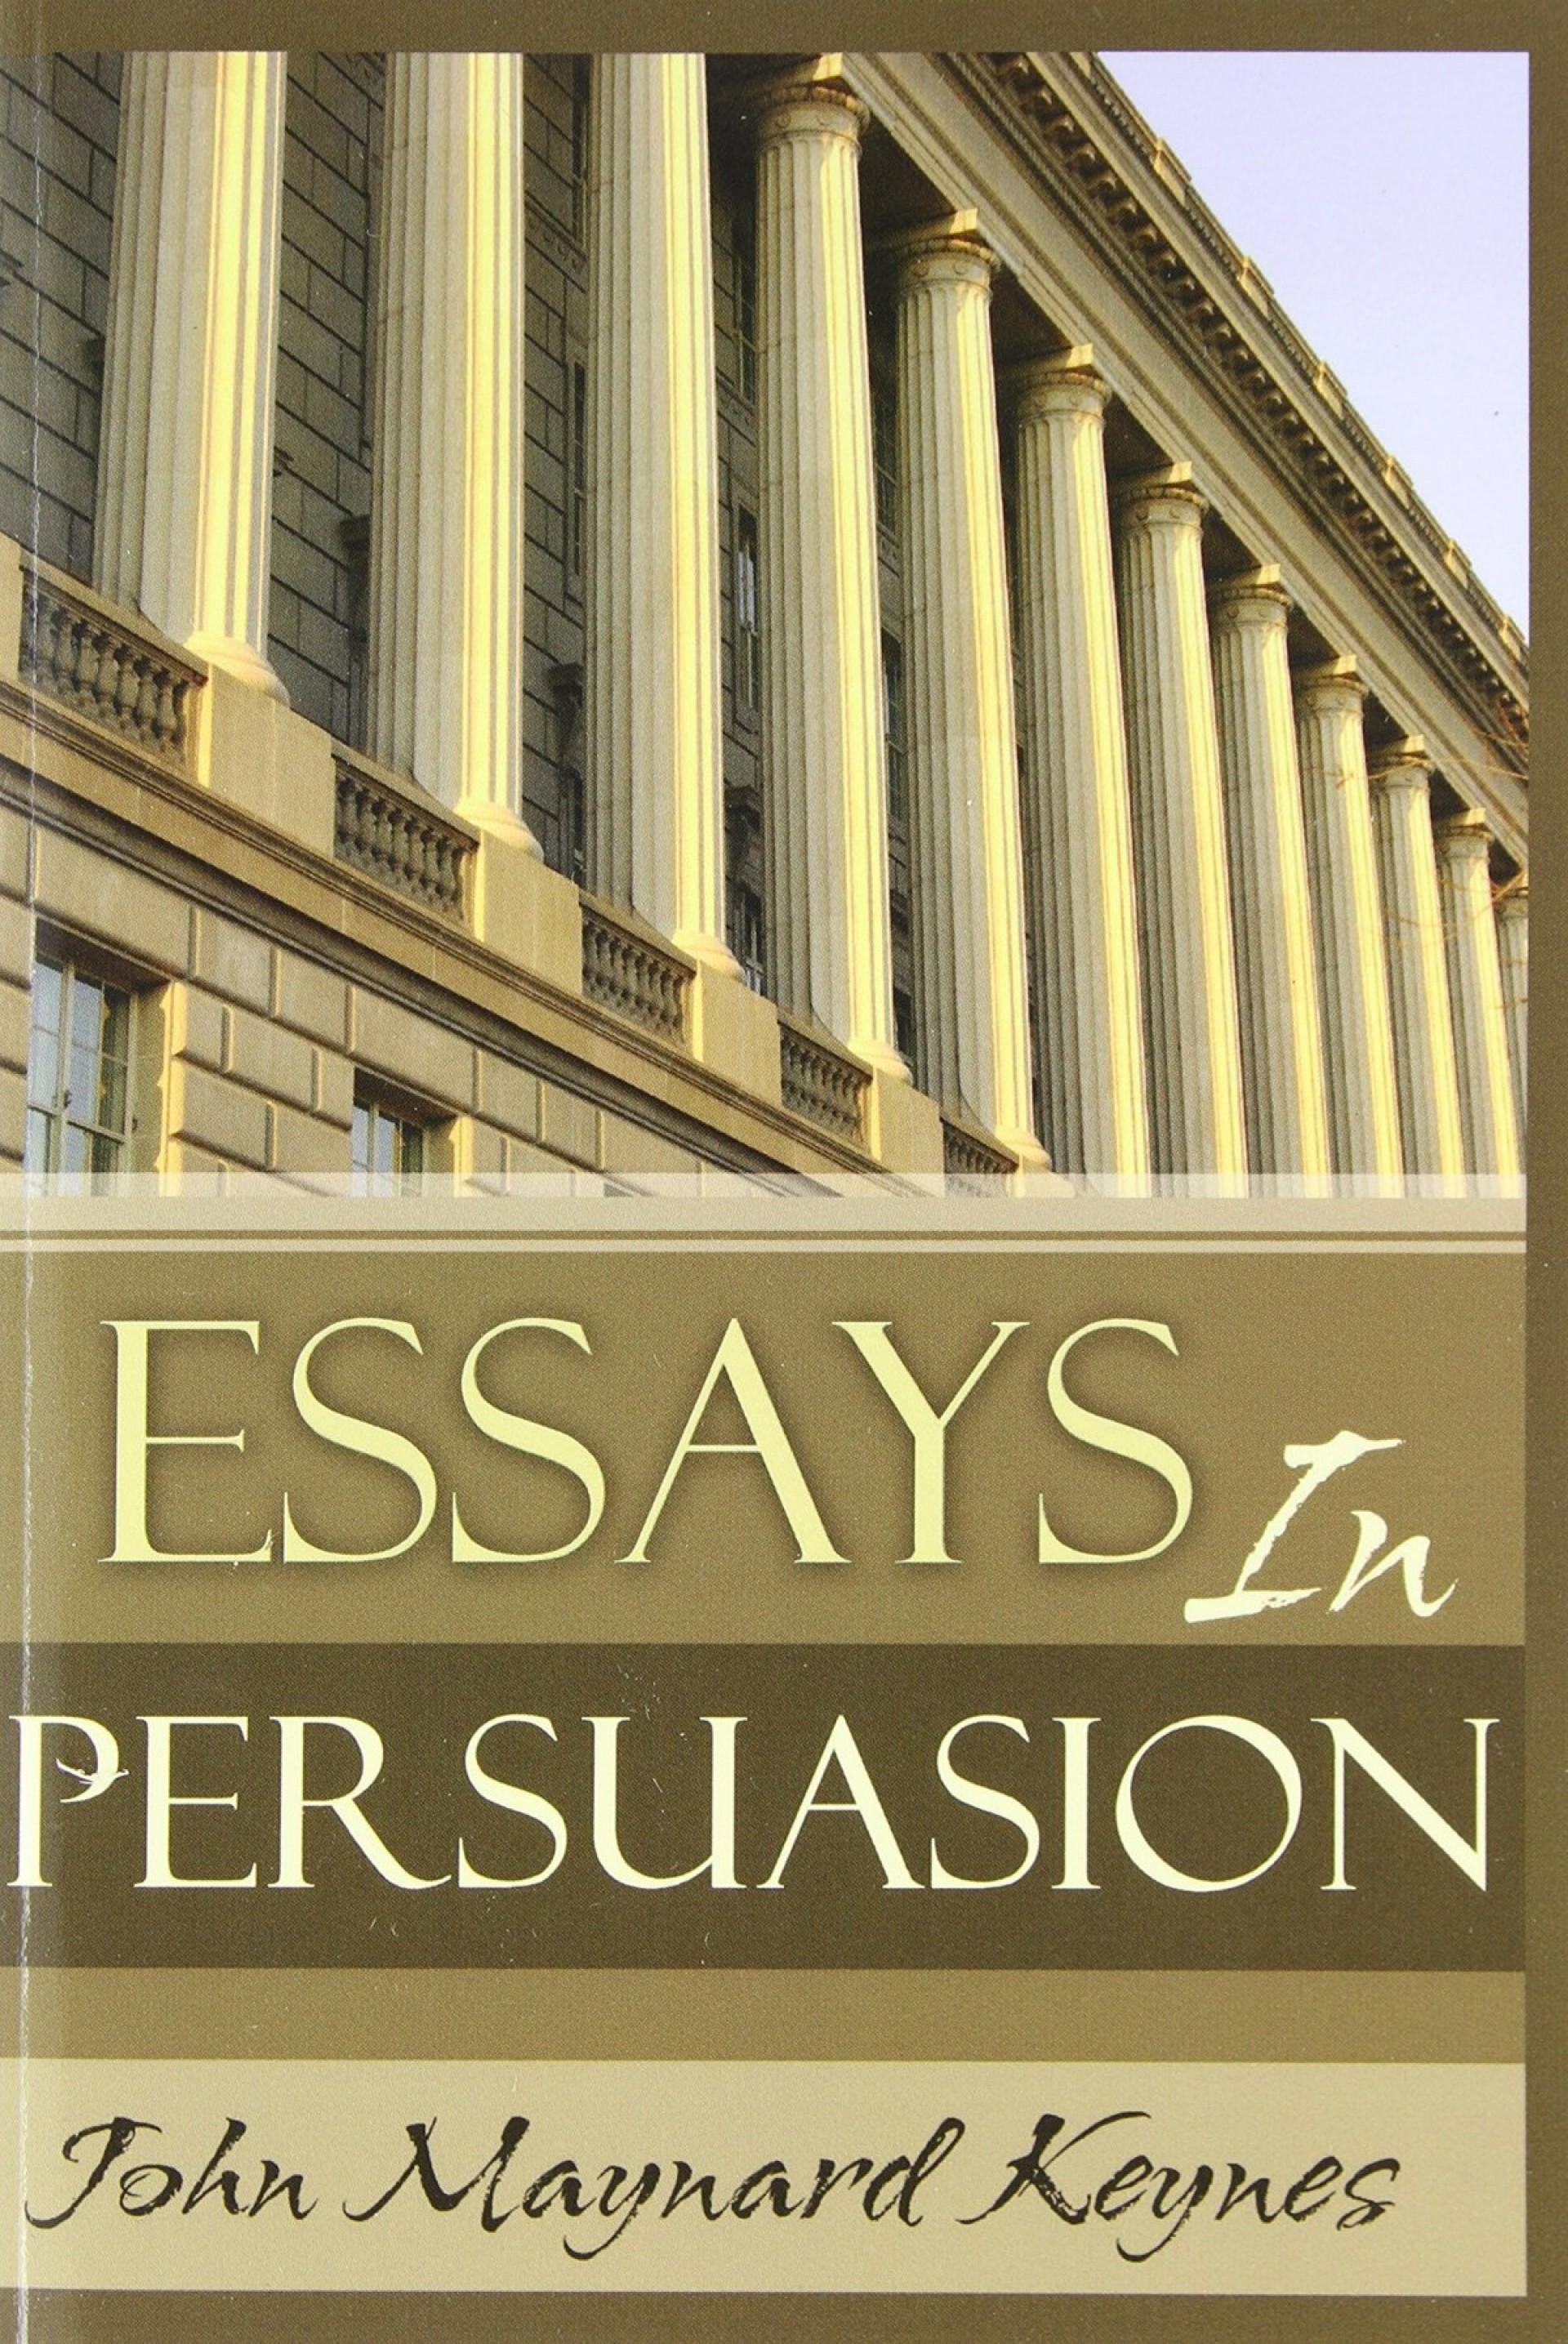 009 Essays In Persuasion By John Maynard Keynes Essay Remarkable Audiobook Pdf Summary 1920